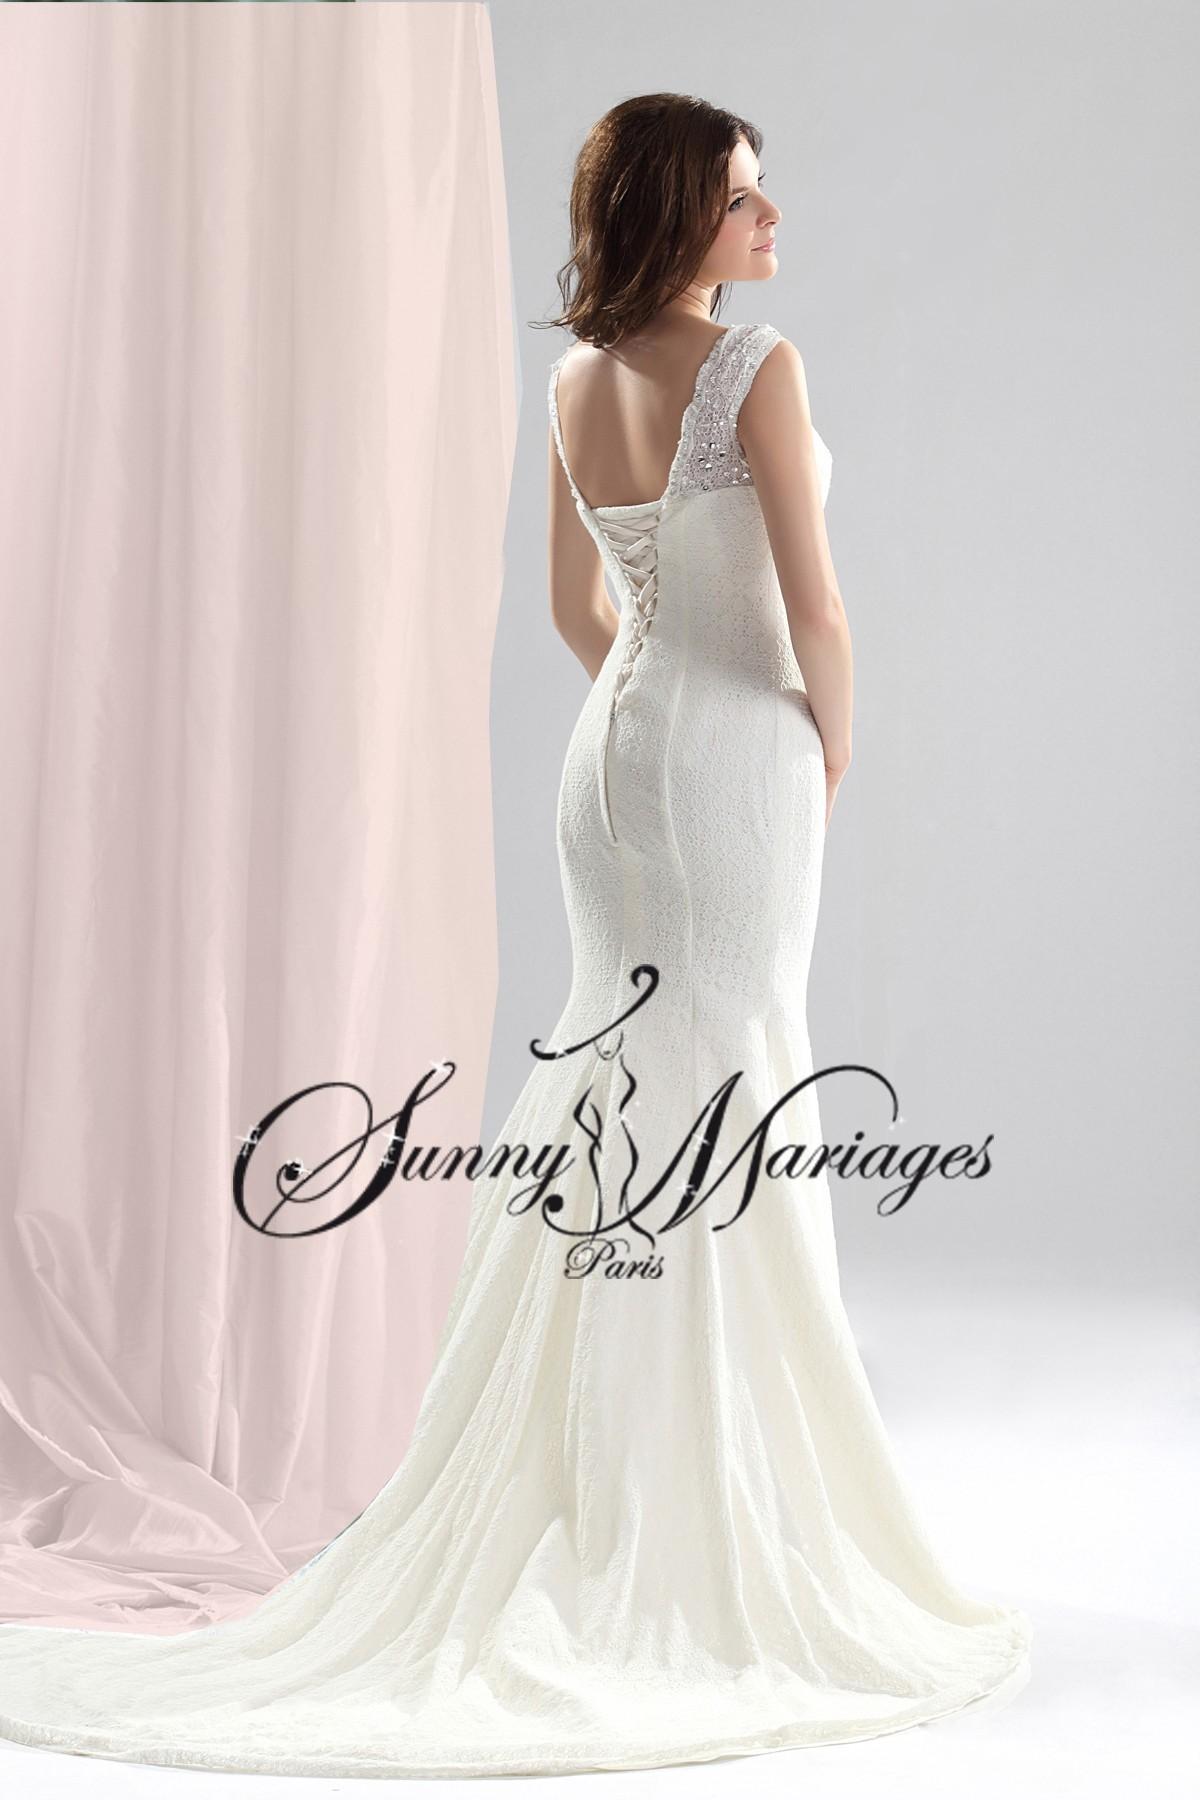 robe-de-mariee-fourreau-en-dentelle-robe-de-mariage-sur-mesure-SUNNY ...